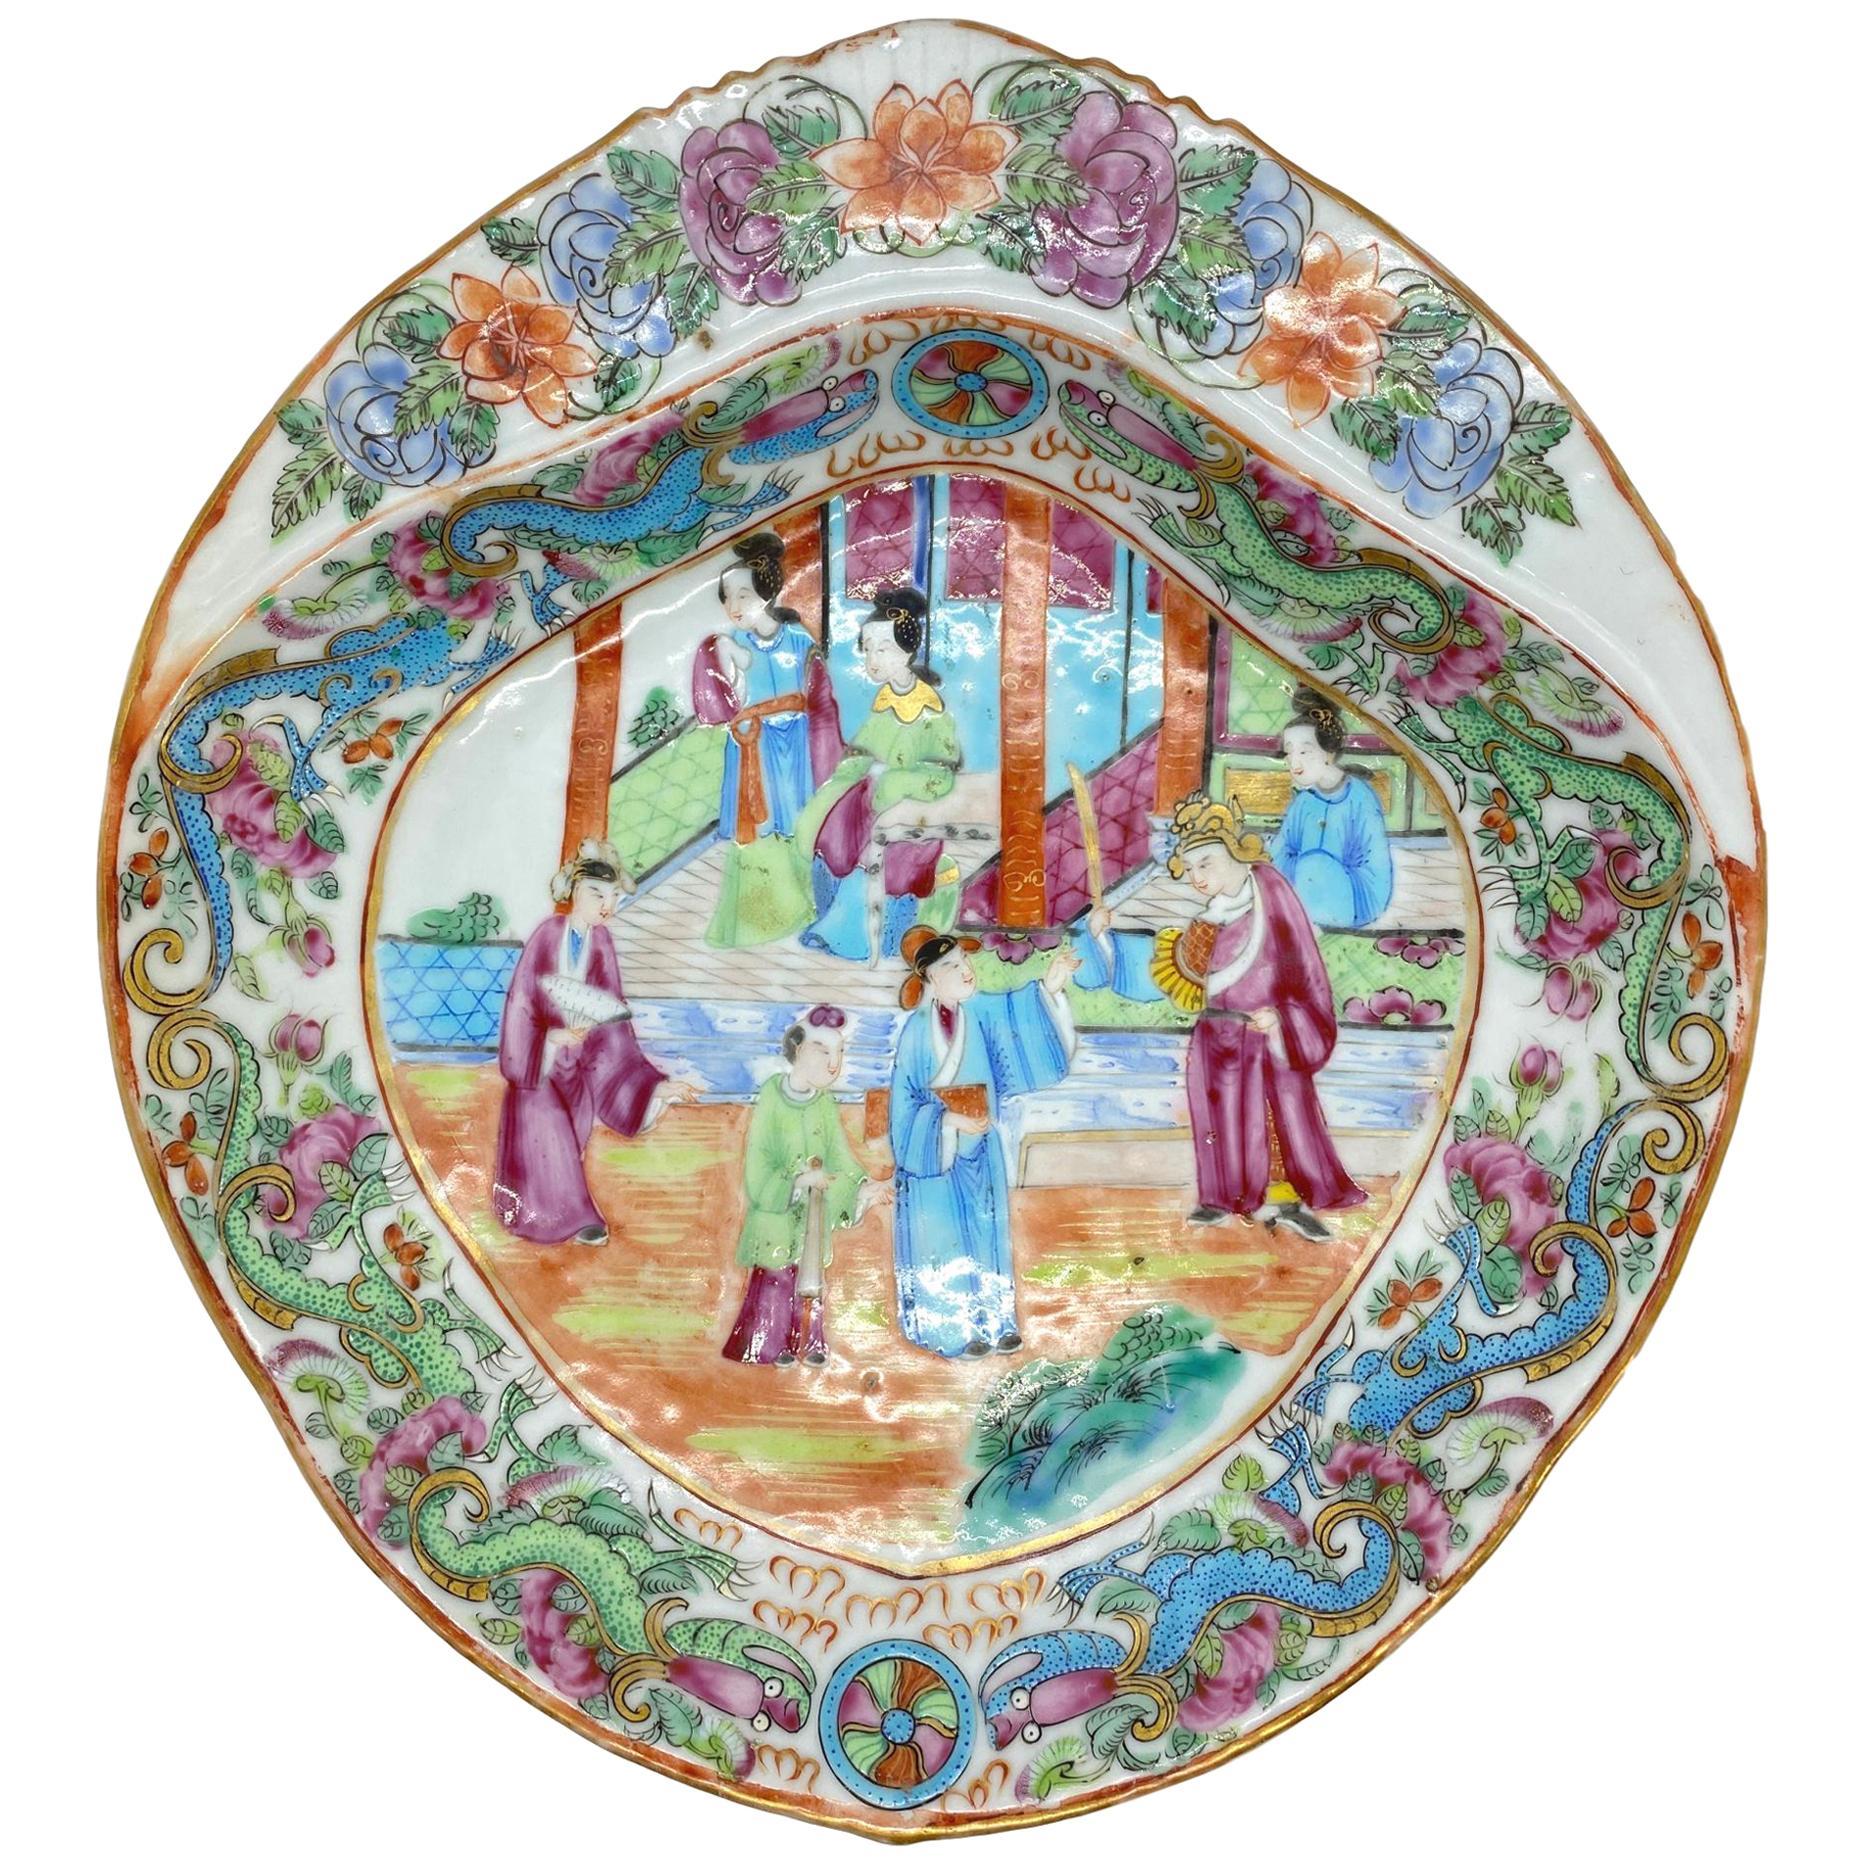 Chinese Export Porcelain Rose Mandarin Shell-Form Shrimp Dish, circa 1820